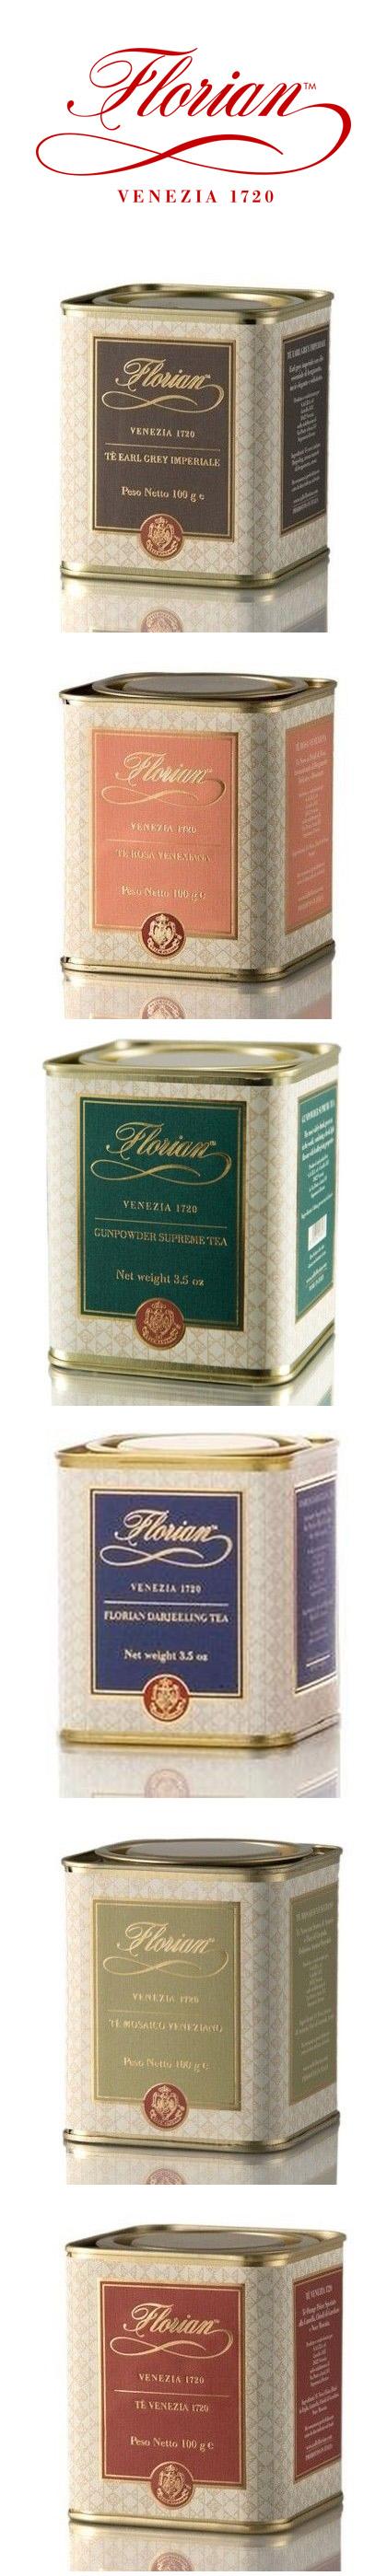 tè florian